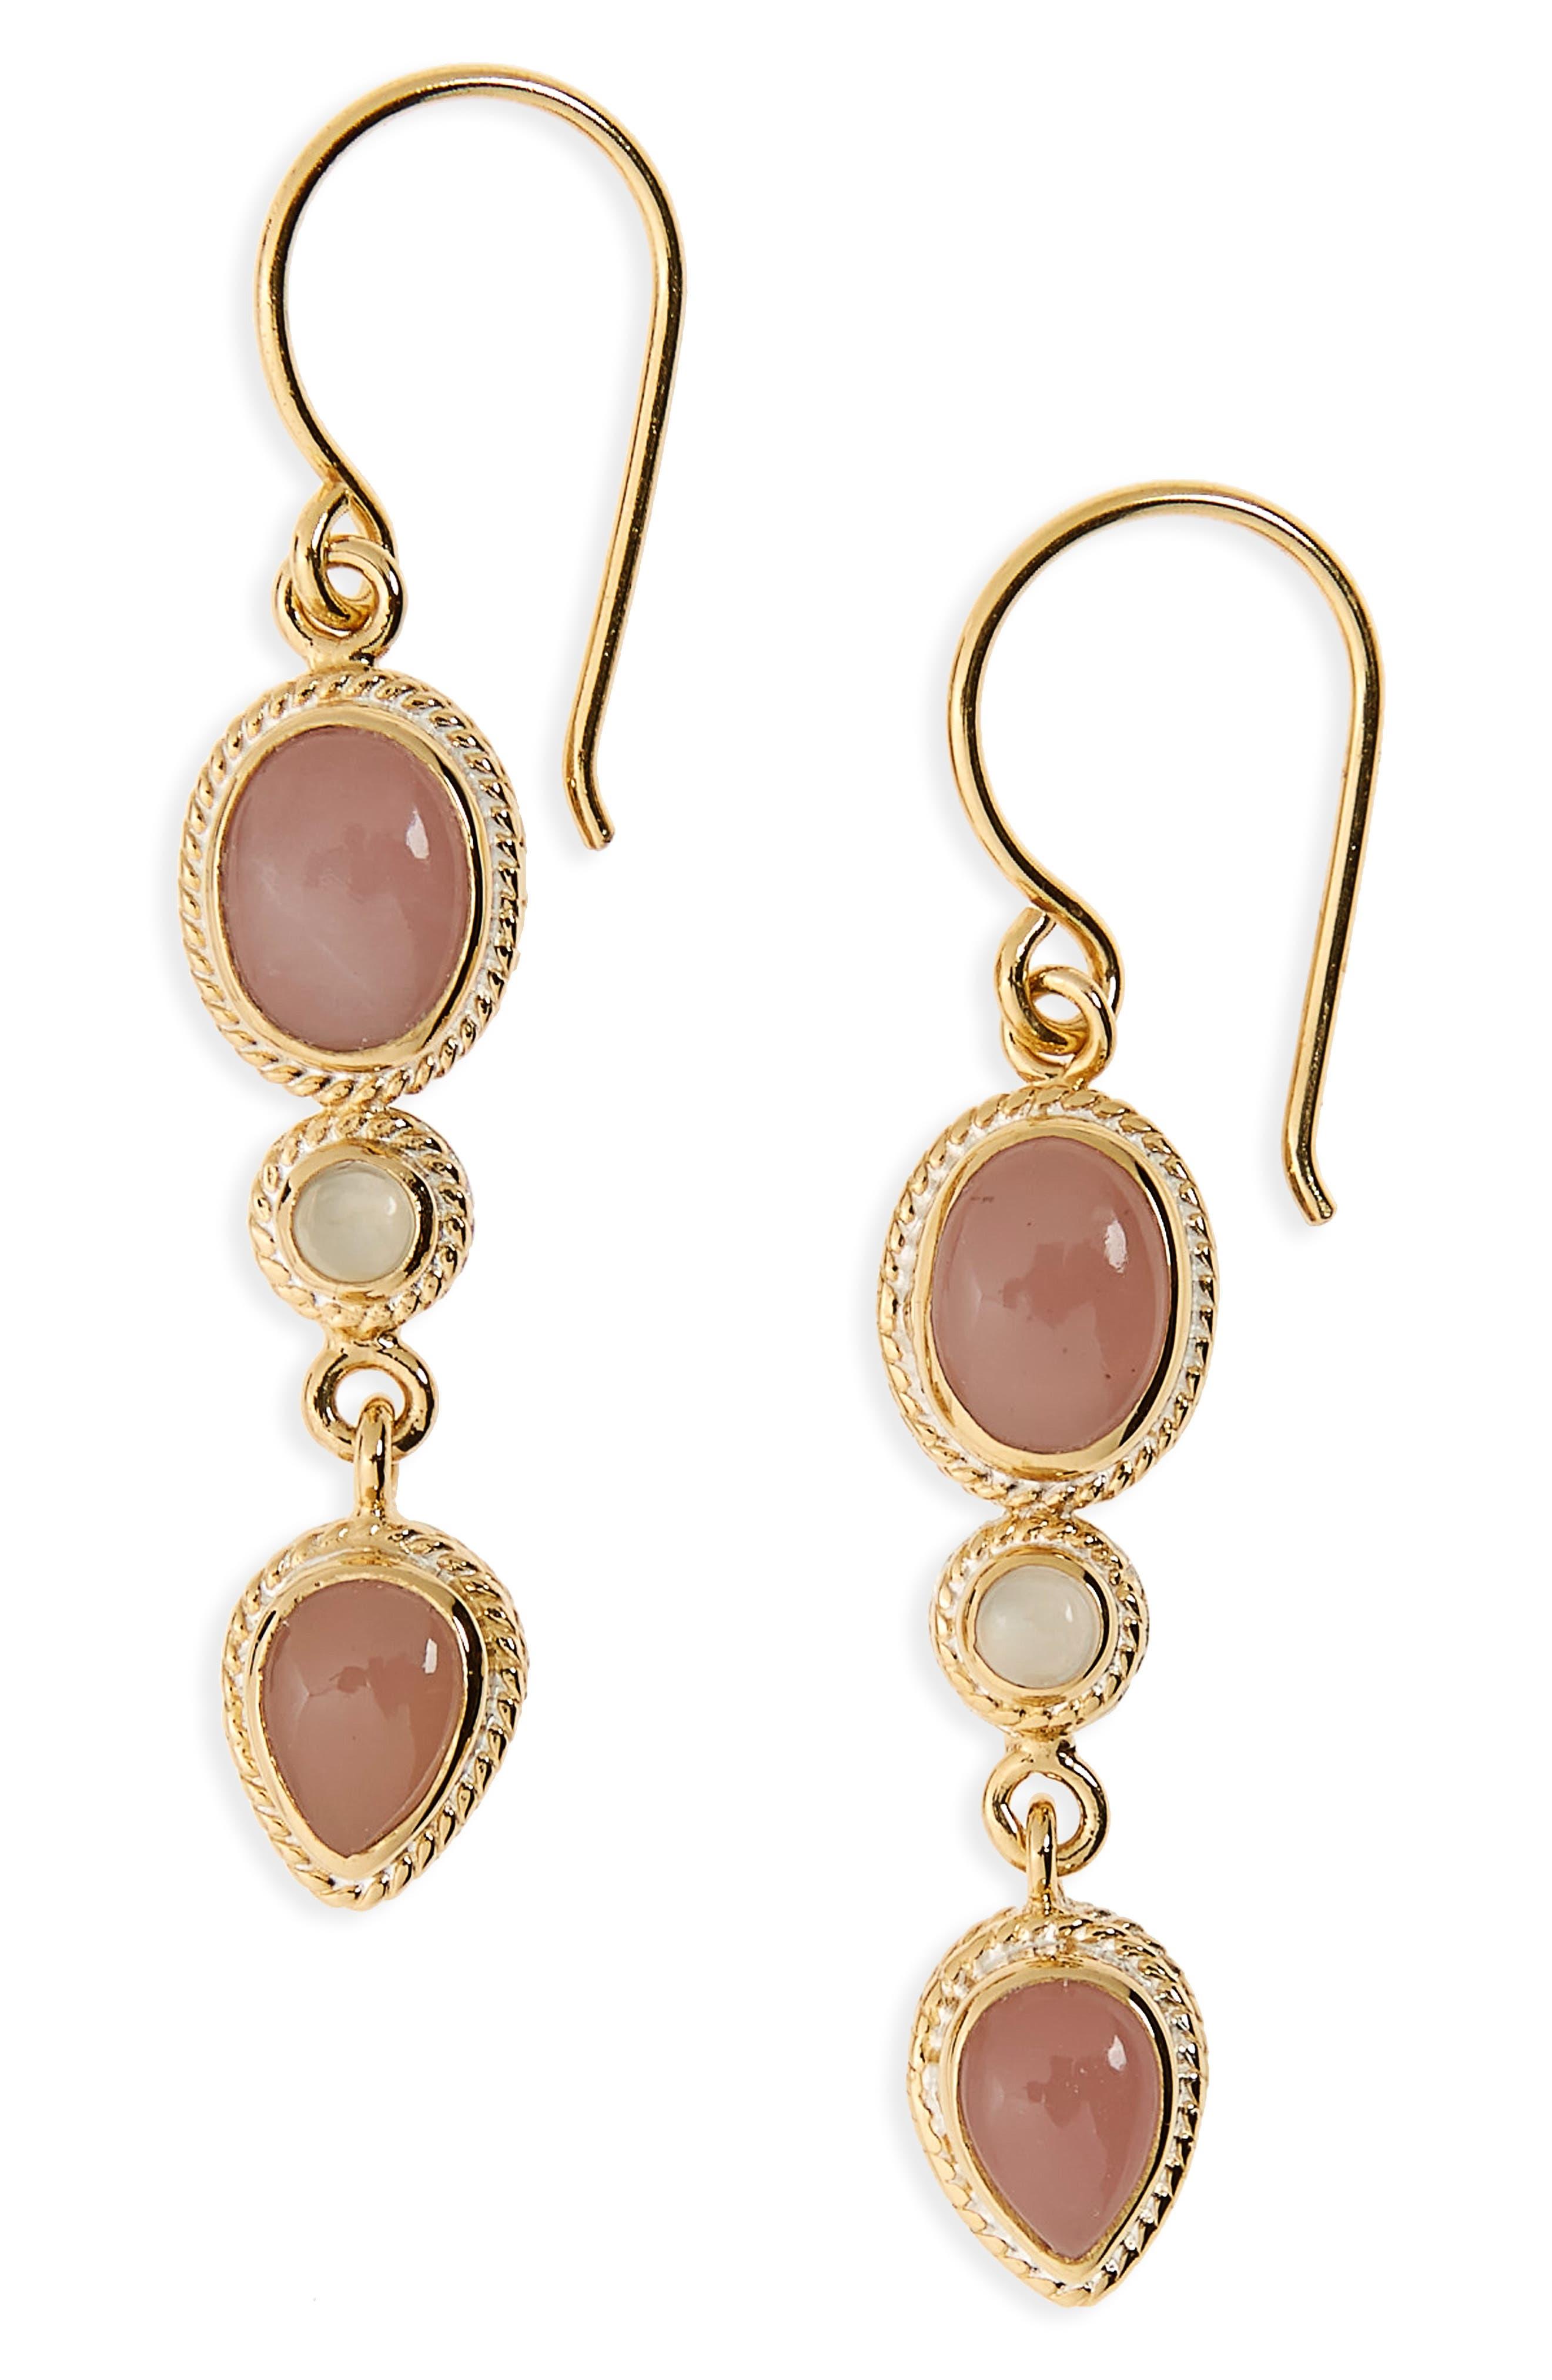 Stone Drop Earrings,                             Main thumbnail 1, color,                             650